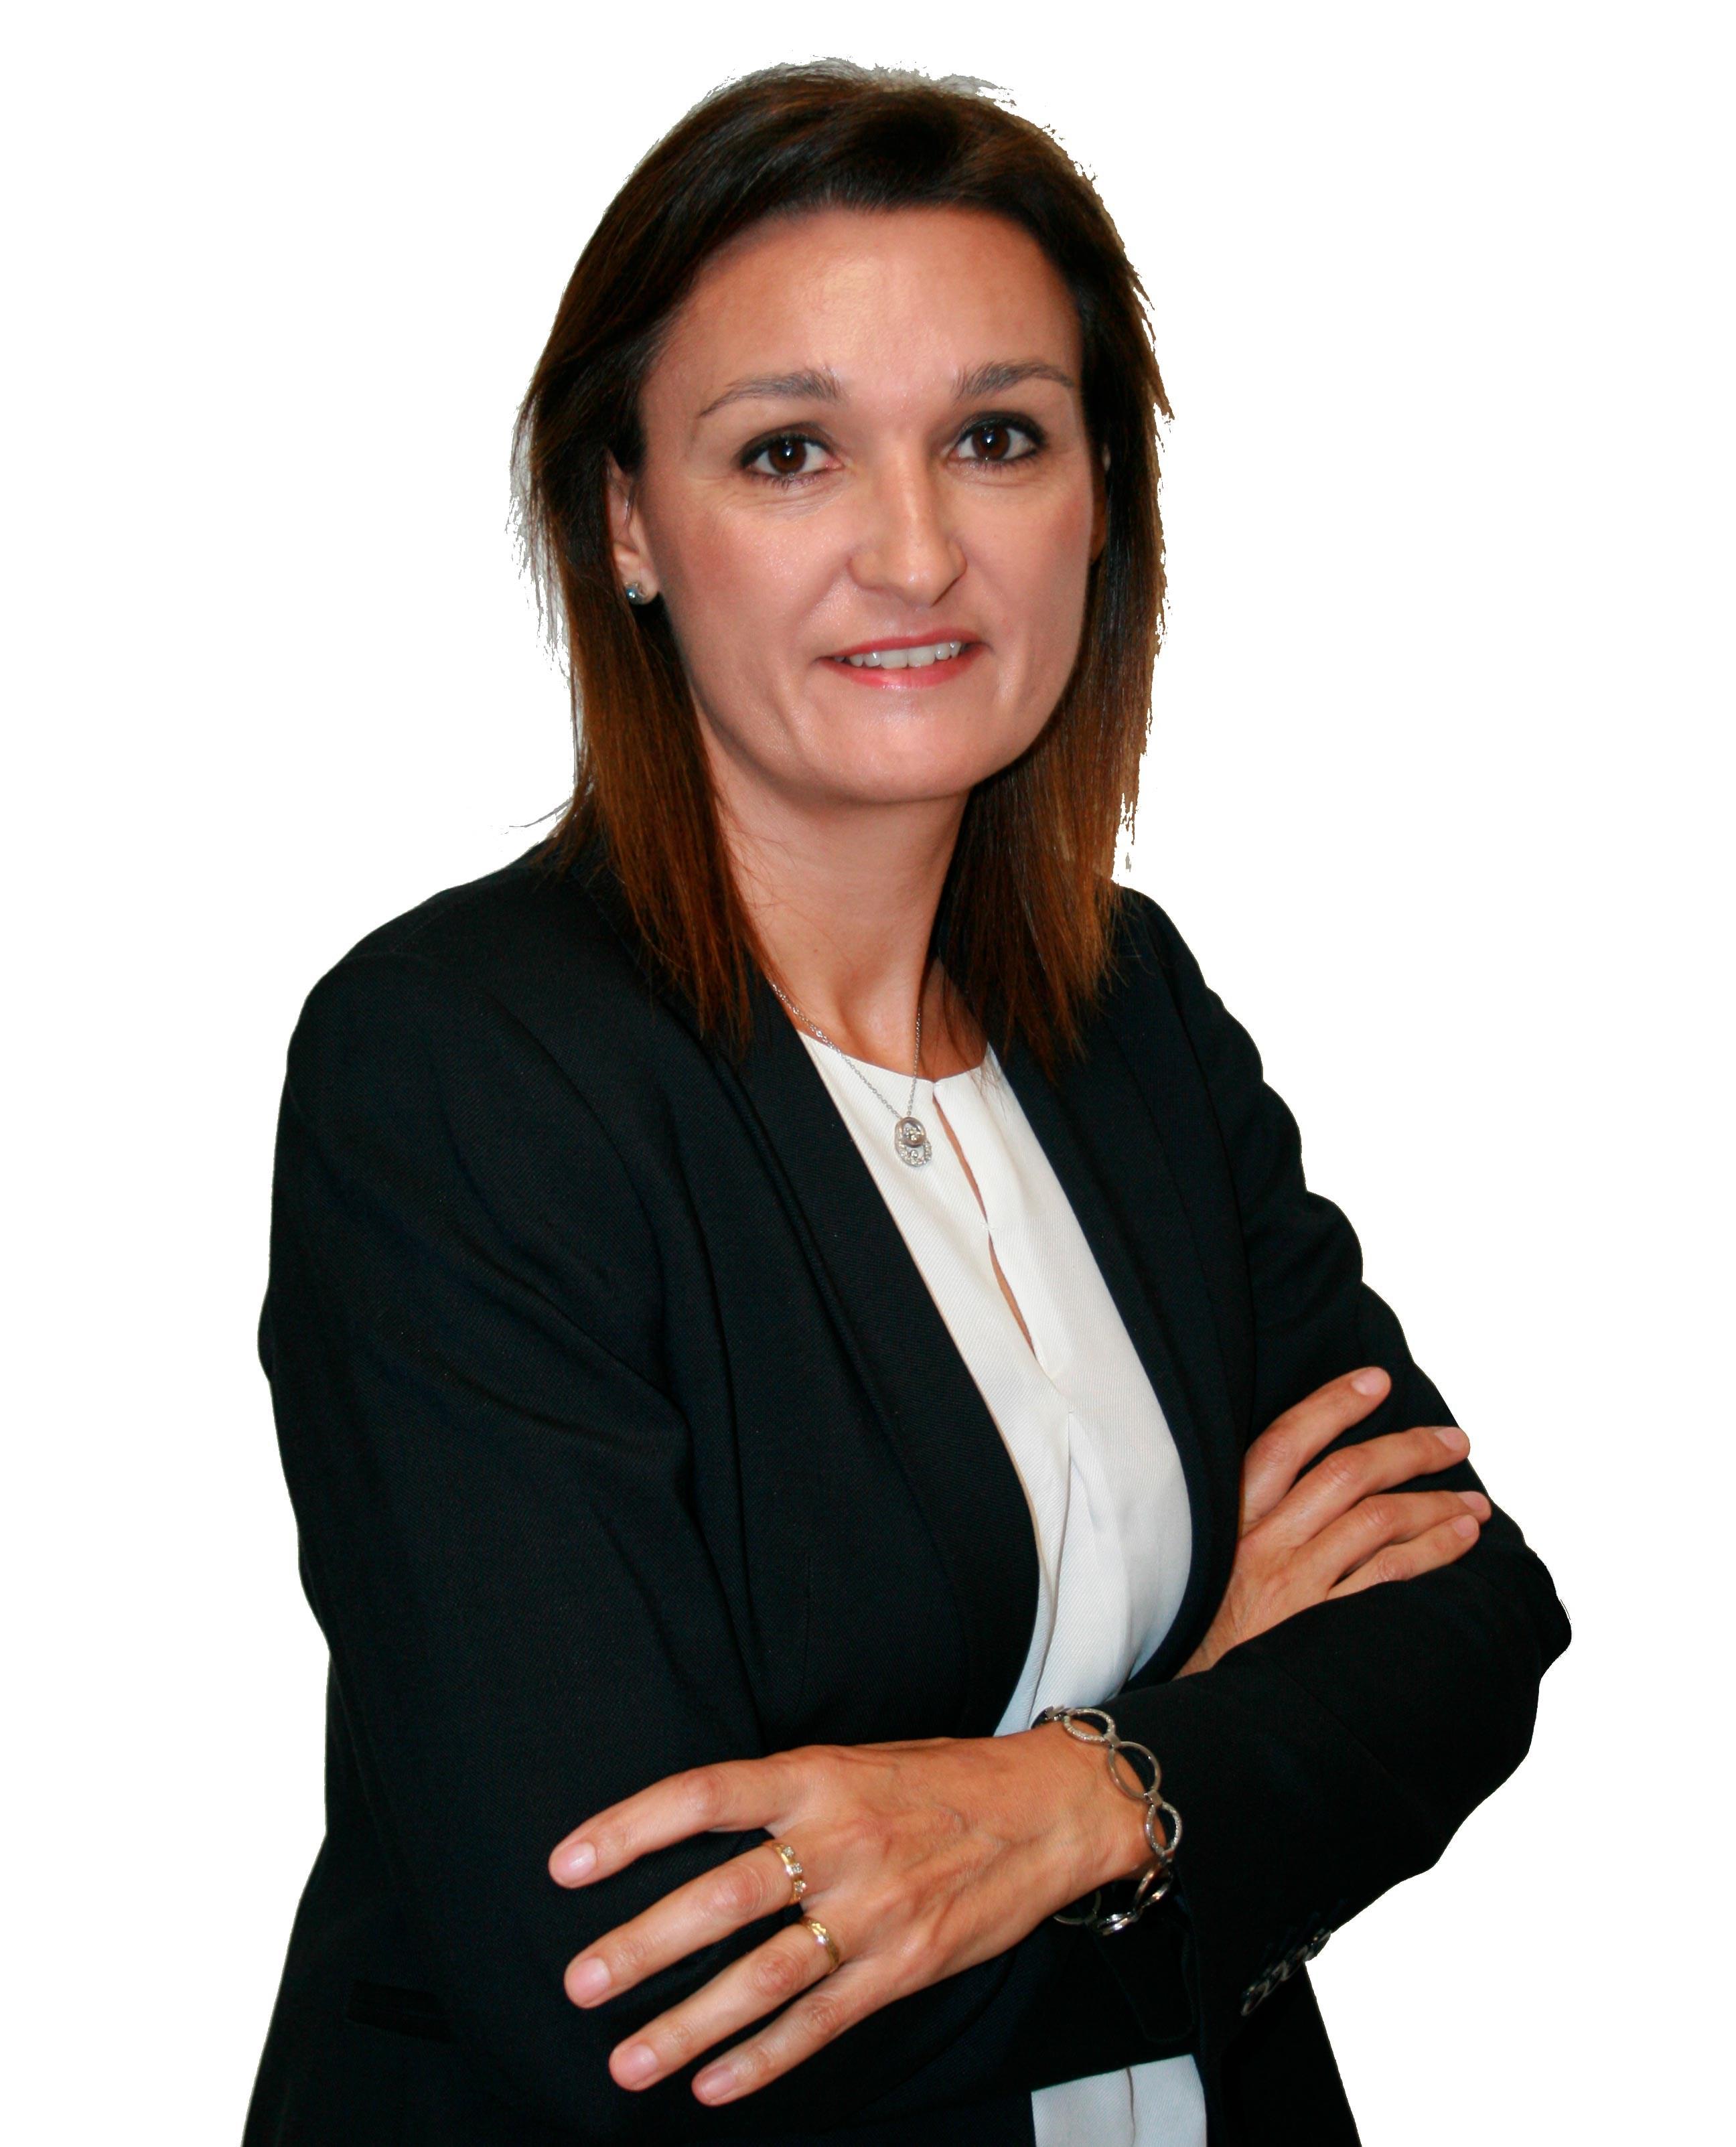 Ana María Ordoñez Ortega